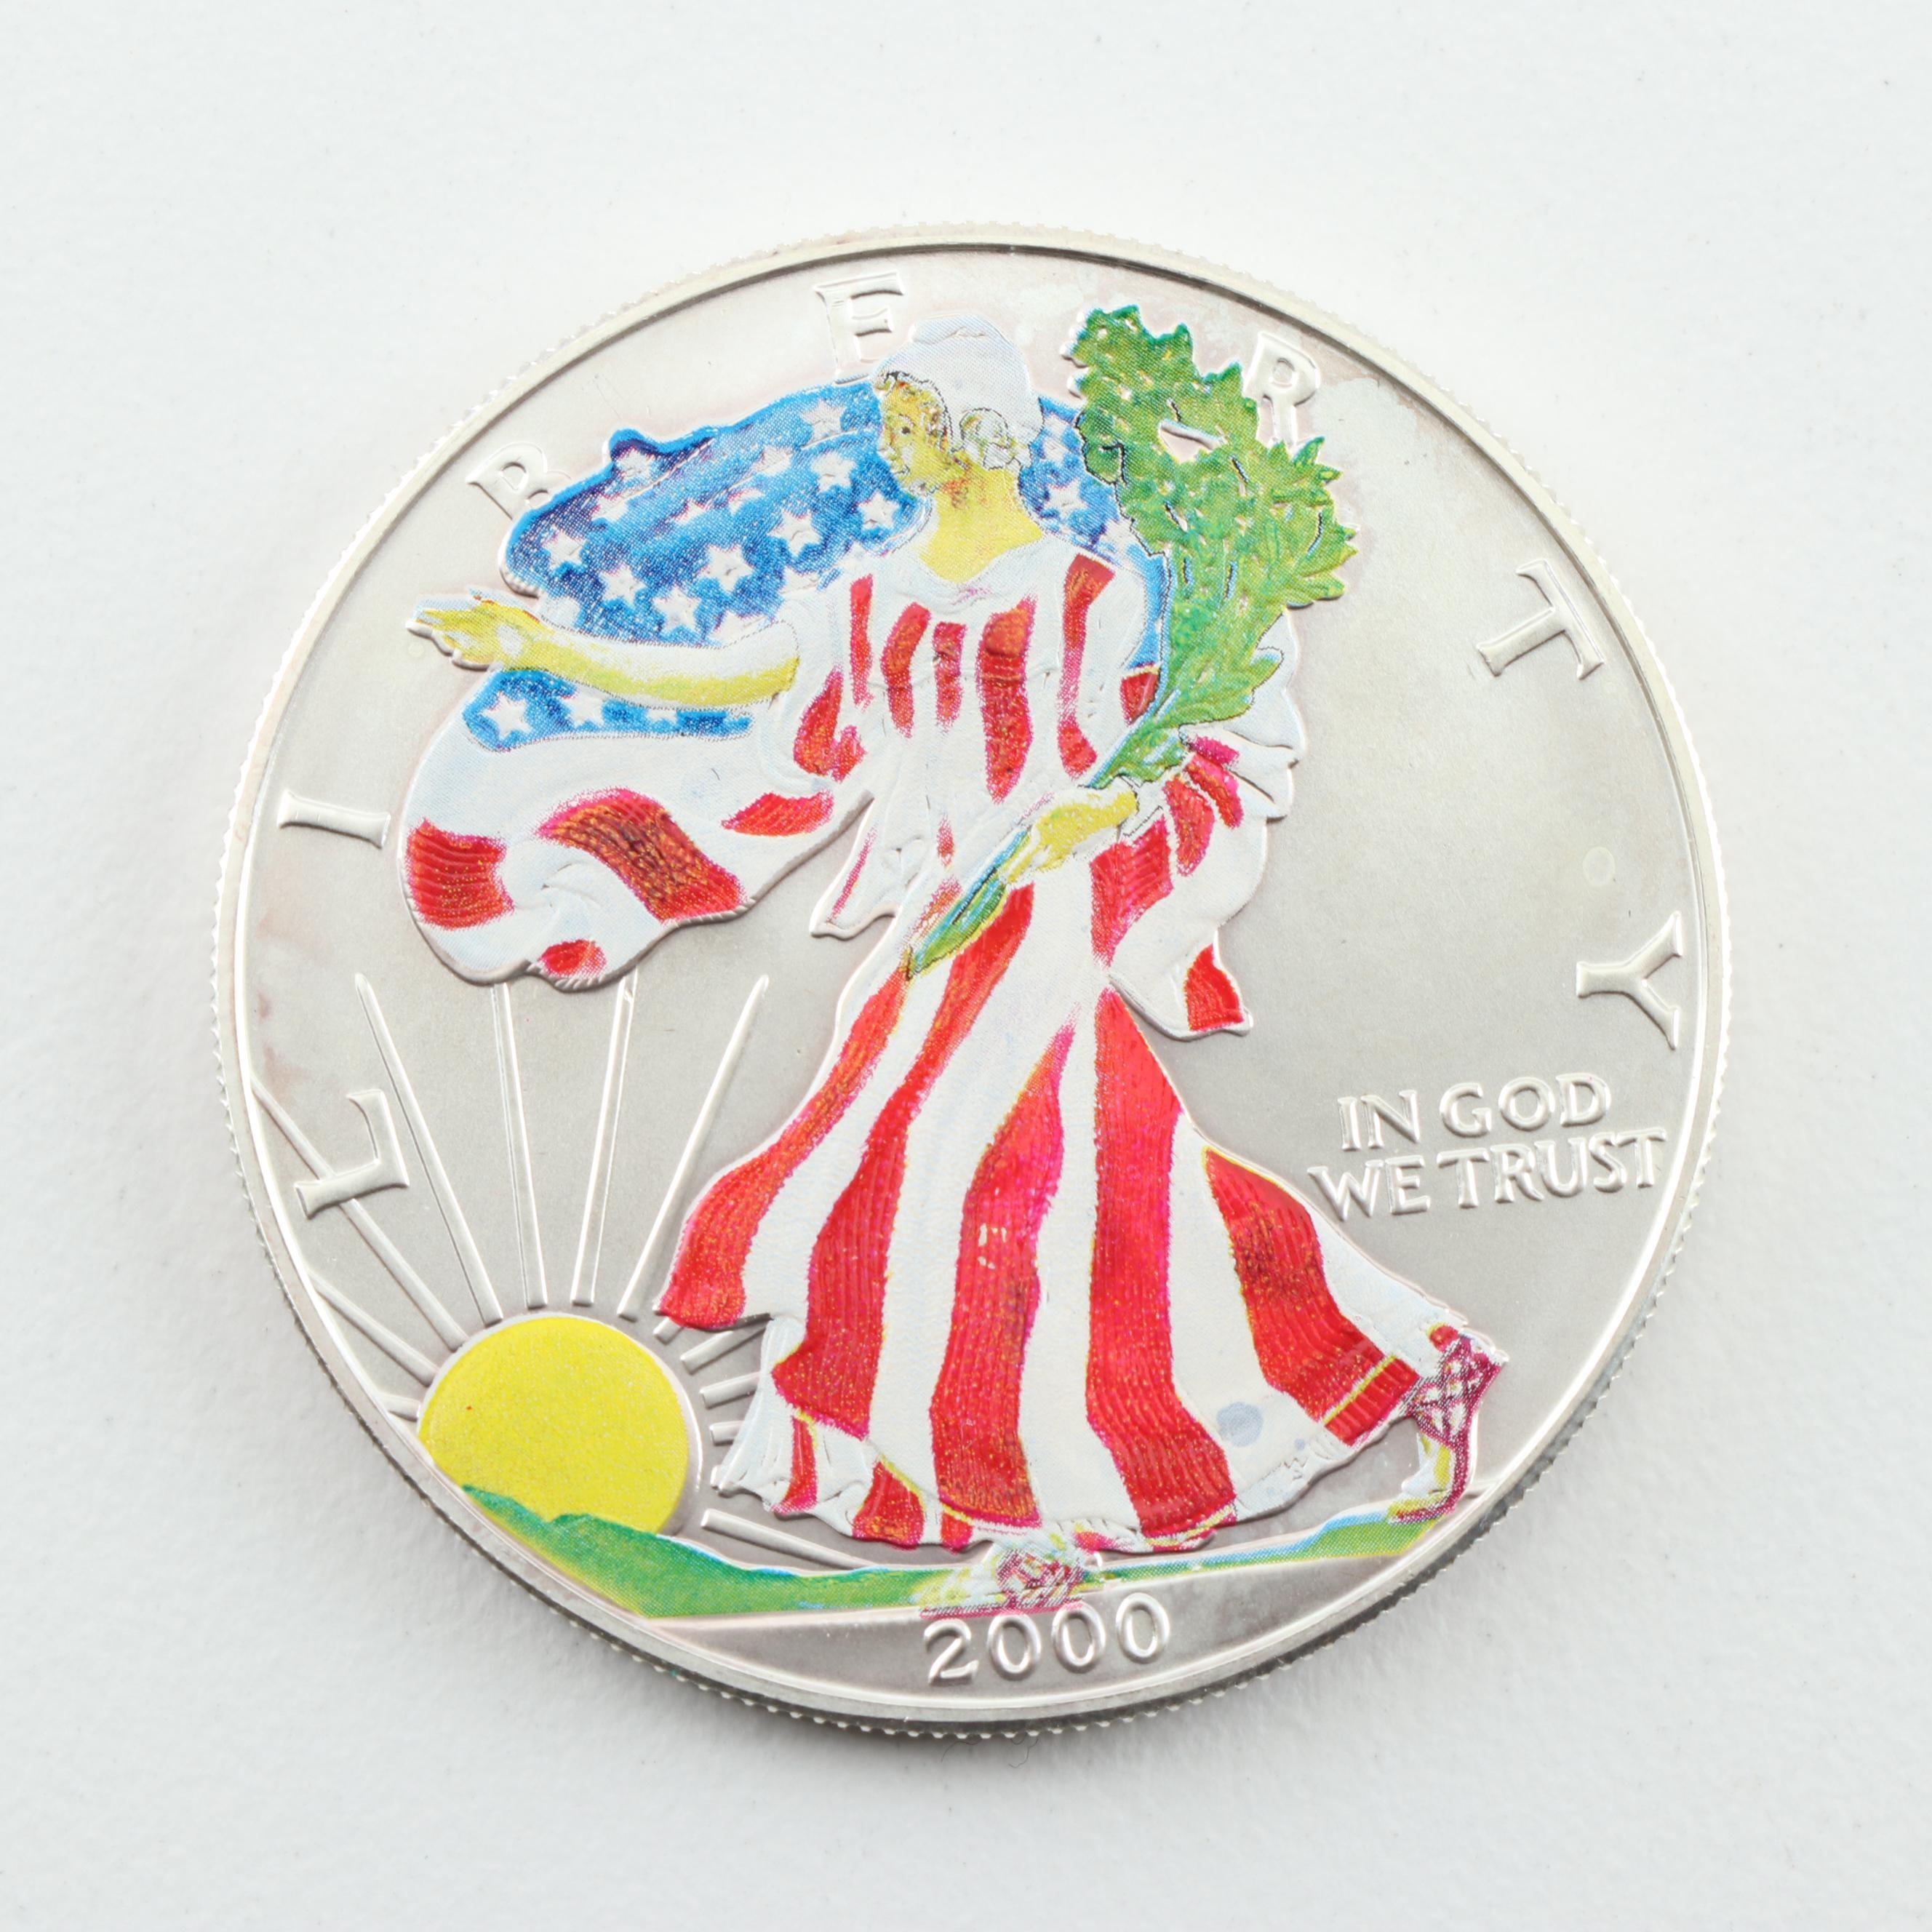 A Colorized 2000 American Silver Eagle Bullion Coin